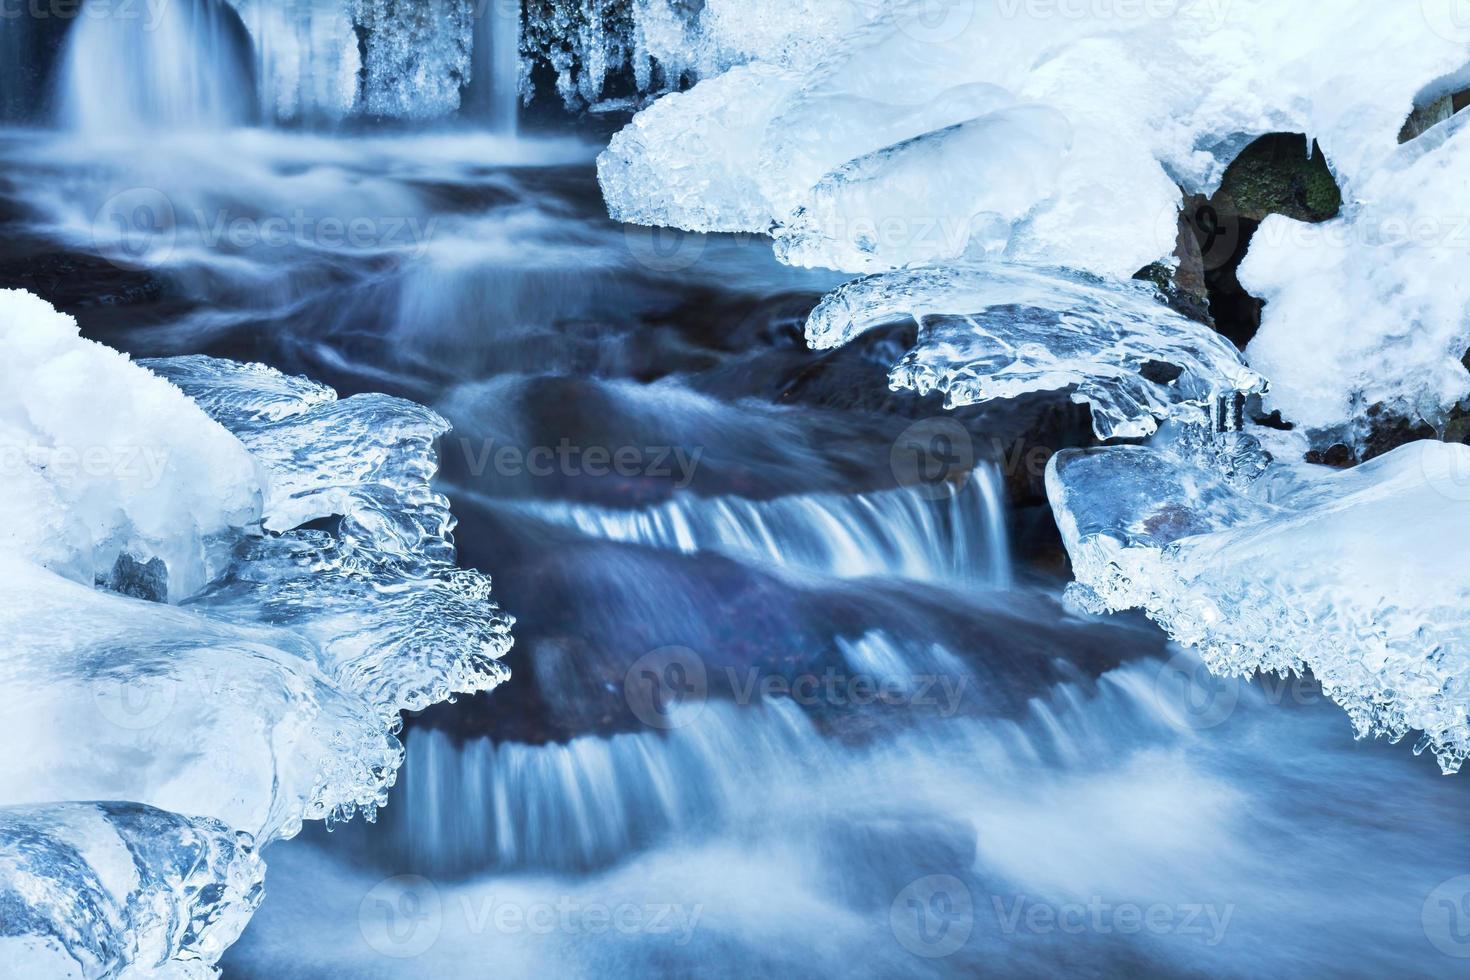 Bach im Winter foto